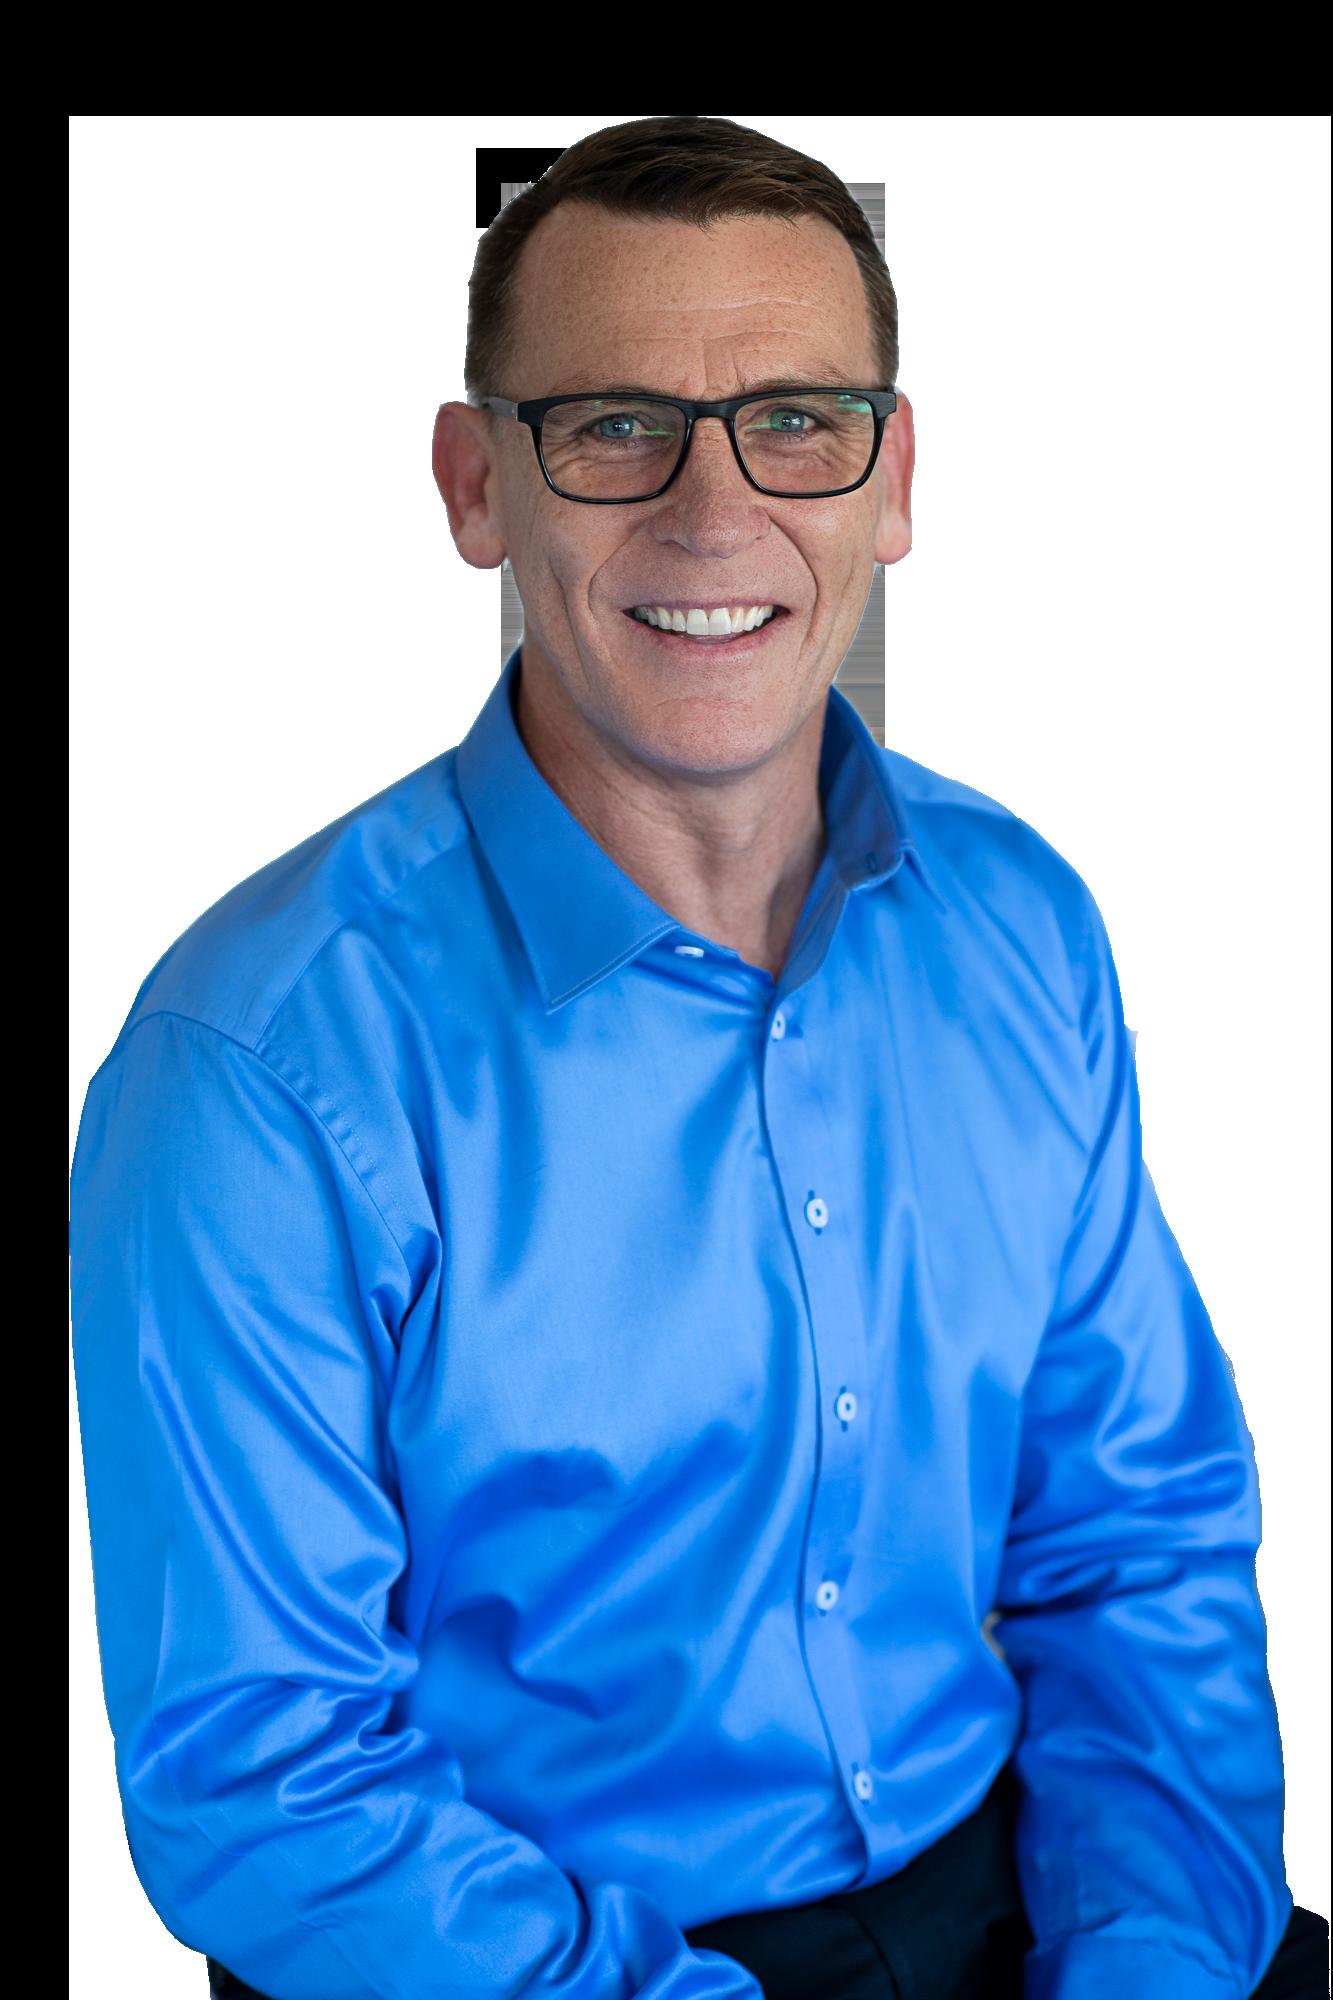 Northern Beaches Orthodontist Dr Roger Hammond